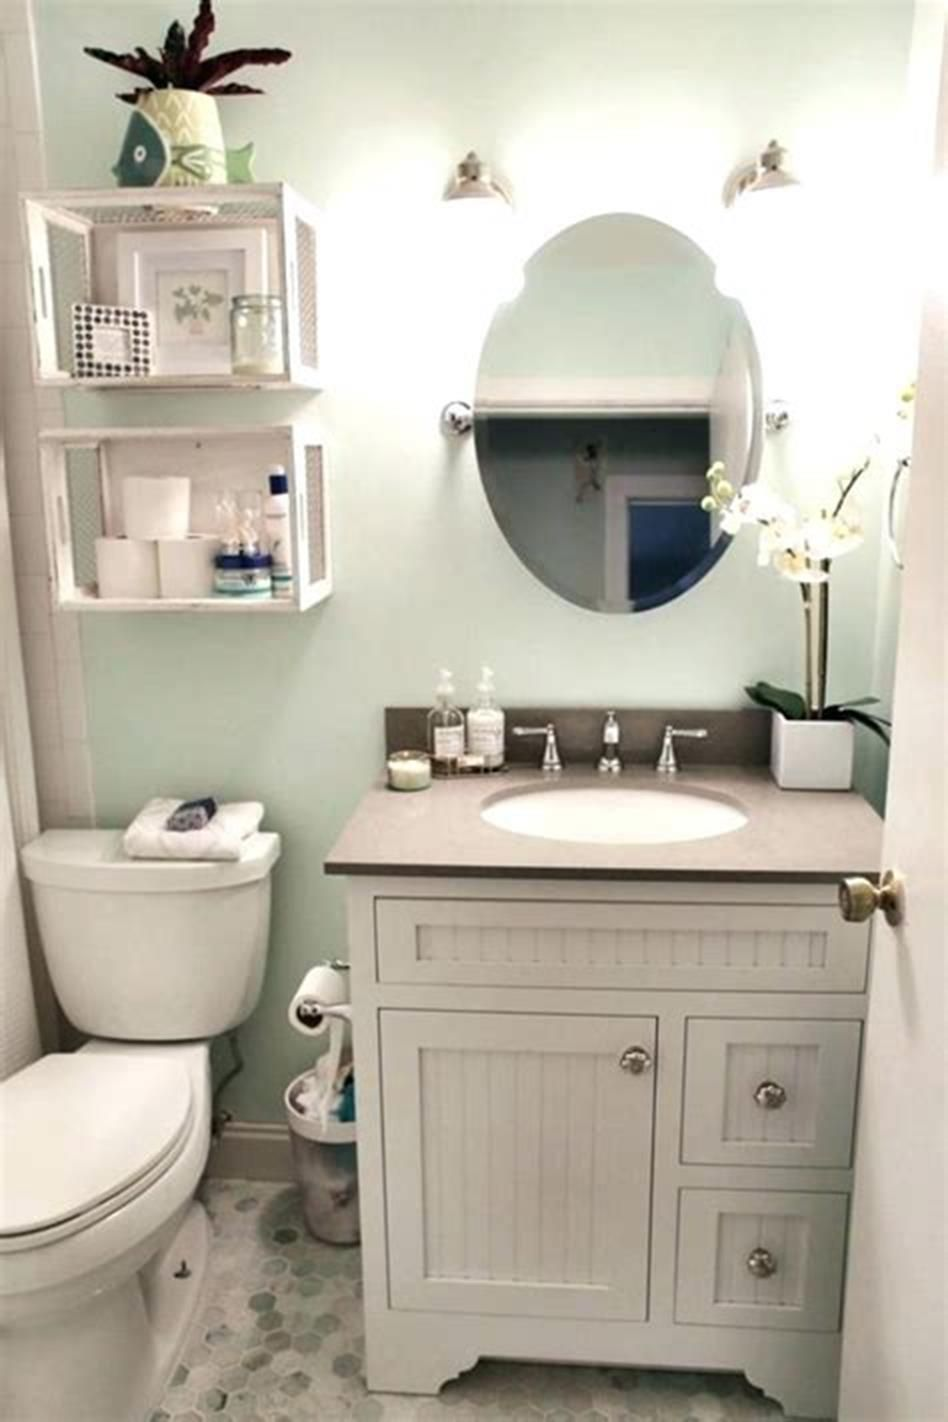 40 Most Popular Half Bathroom Decor Ideas 2019 Decorequired In 2020 Small Half Bathrooms Half Bathroom Decor Guest Bathroom Small